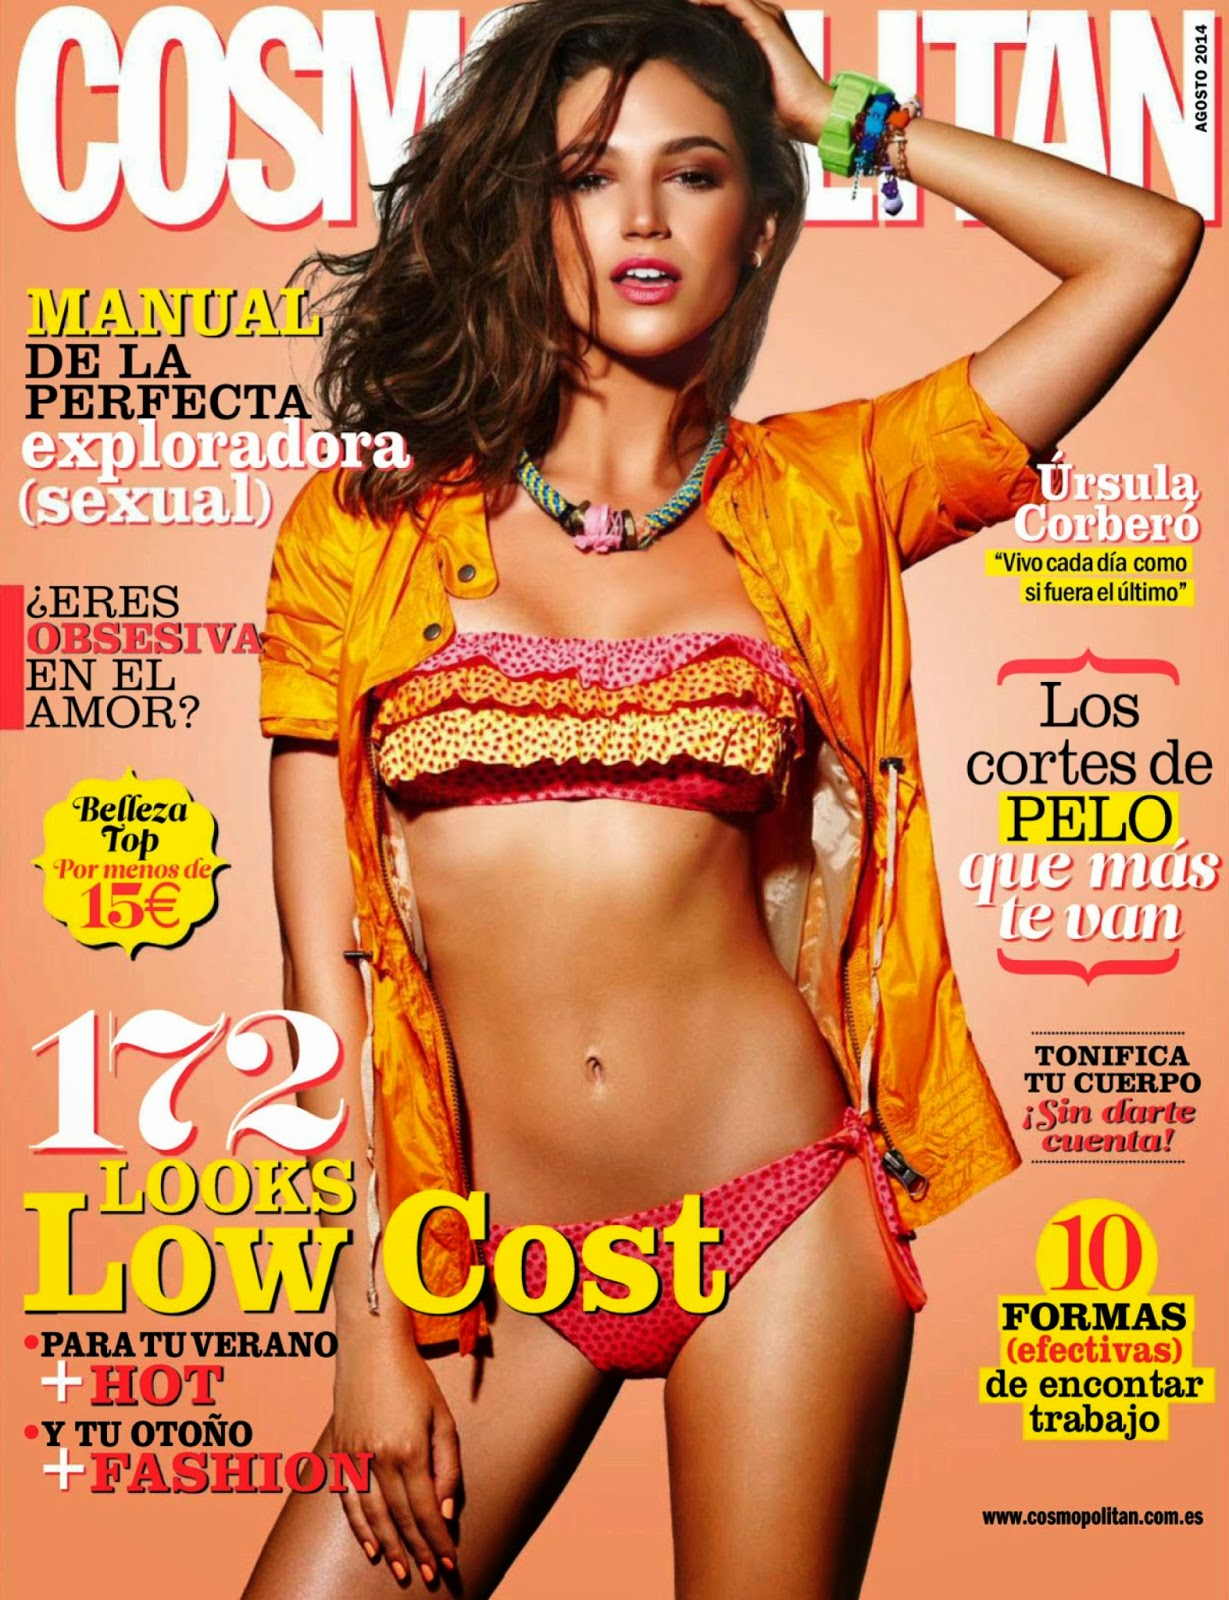 Ursula Corbero - Cosmopolitan Magazine, Spain, August 2014